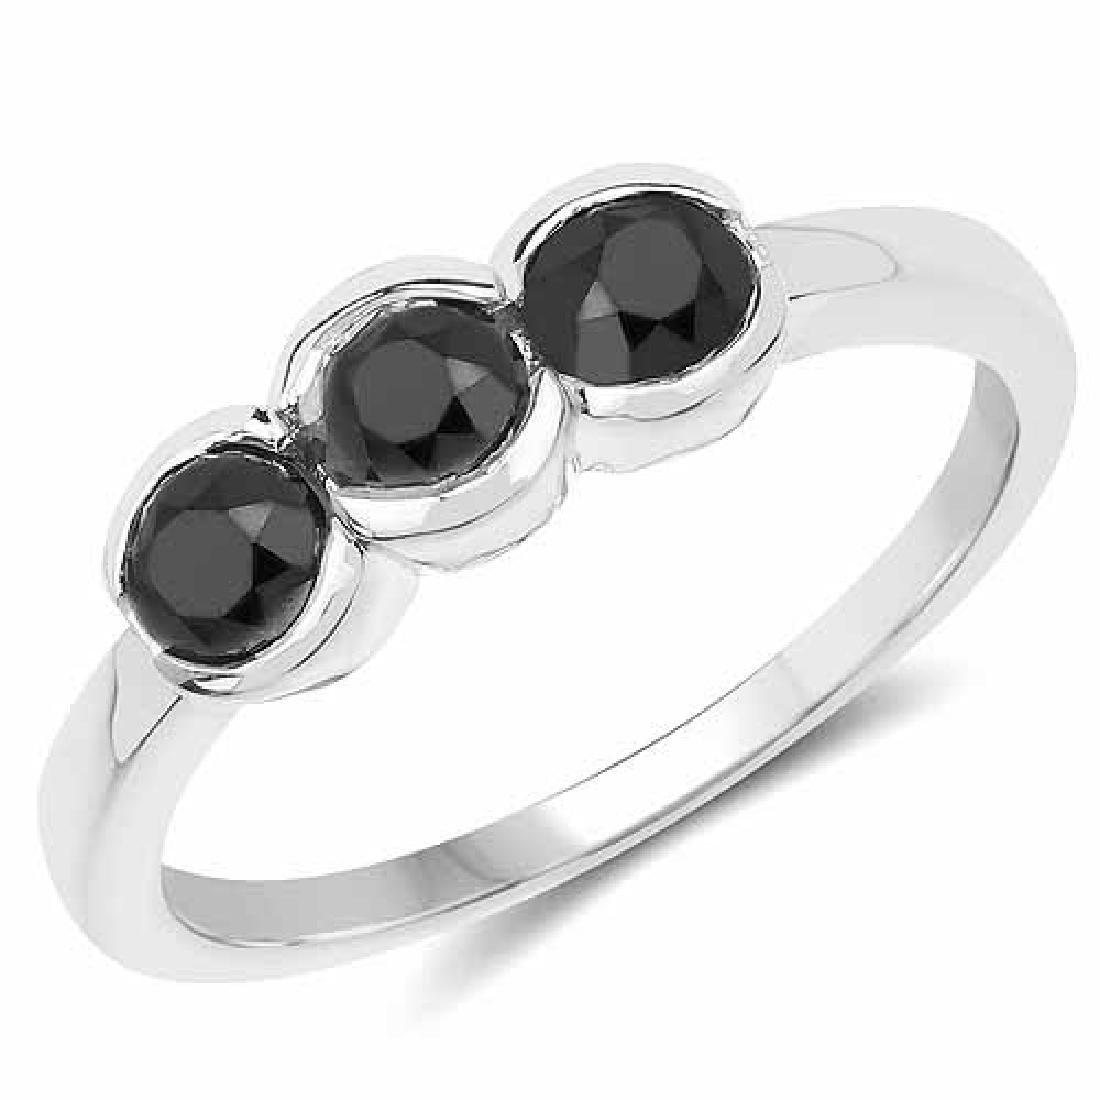 1.16 Carat Genuine Black Diamond .925 Sterling Silver R